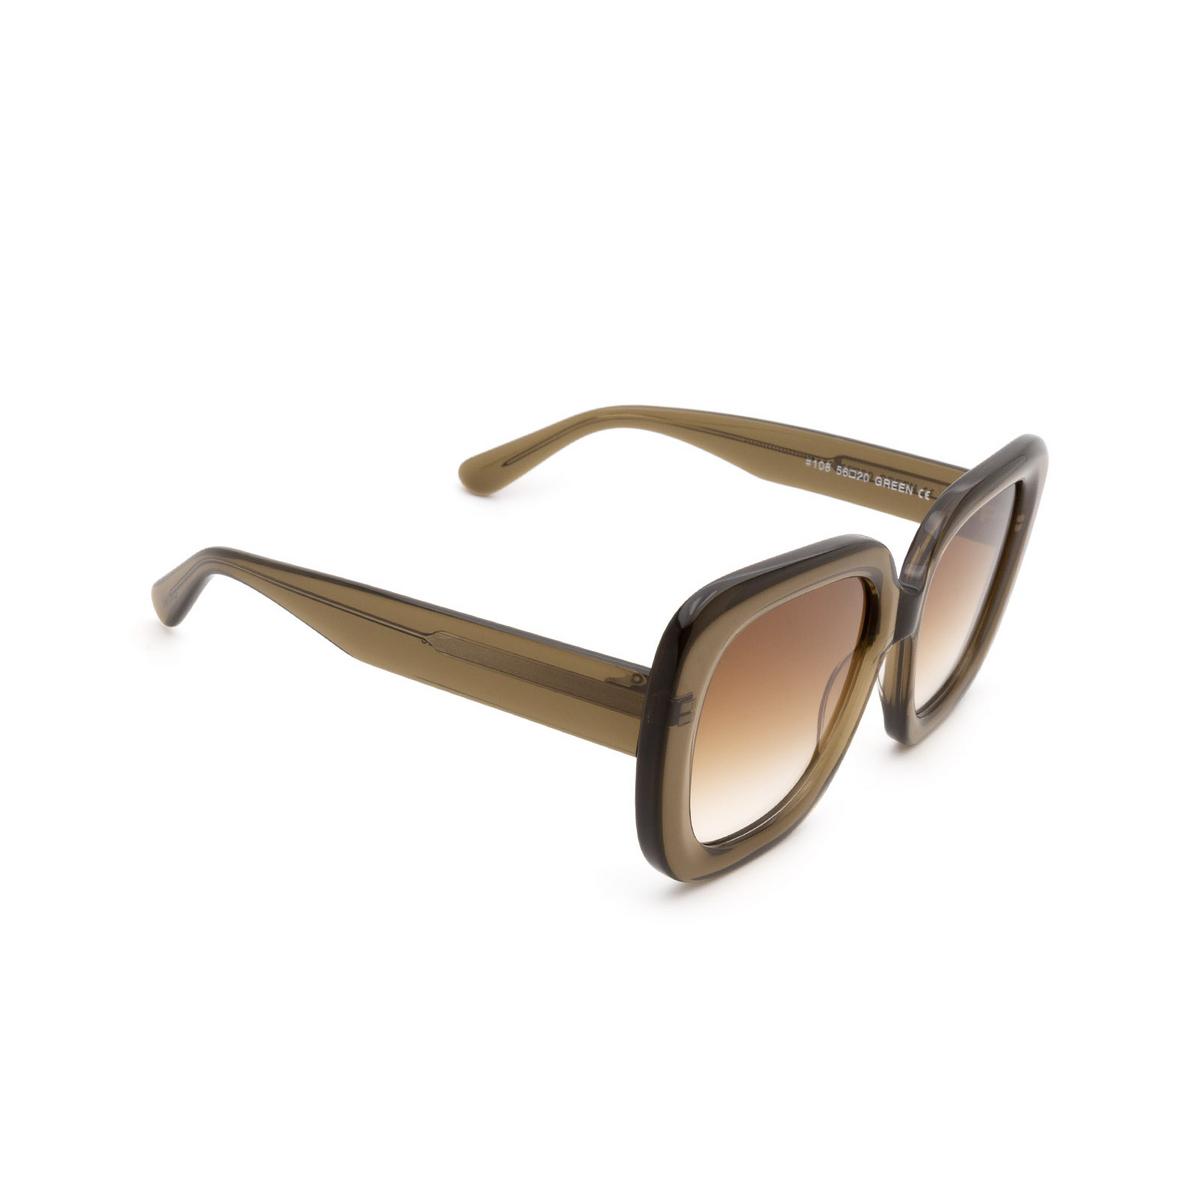 Chimi® Square Sunglasses: #108 color Olive Green Green - three-quarters view.